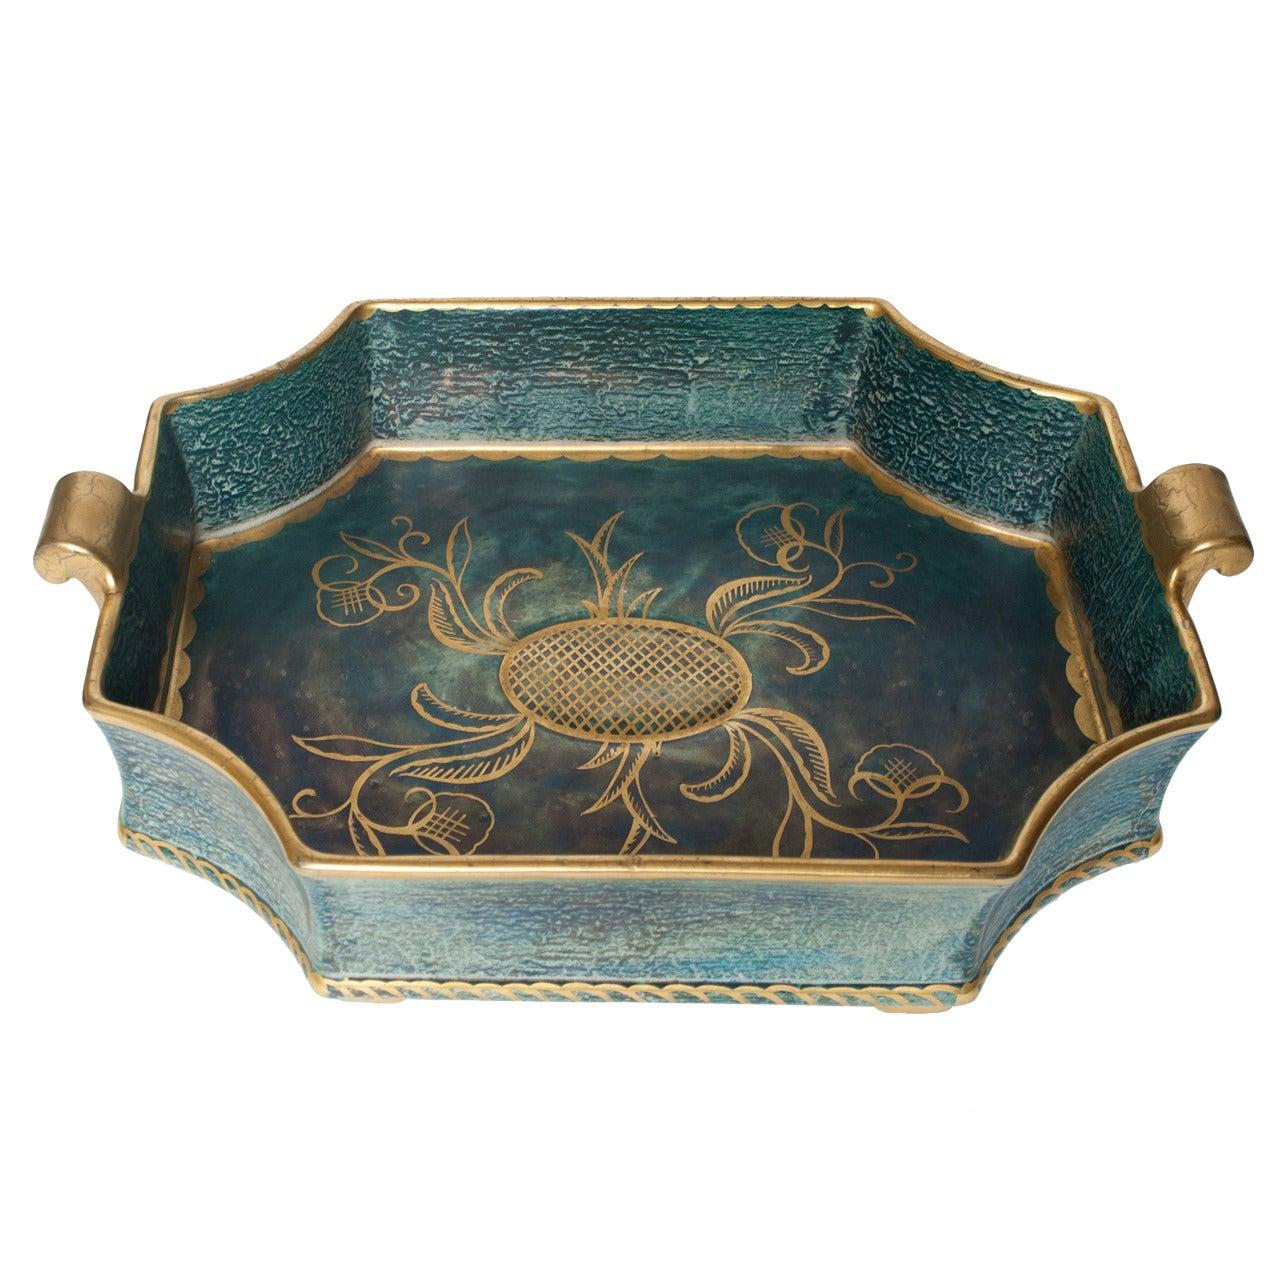 Swedish Art Deco Tray / Bowl by Josef Ekberg, Gustavsberg